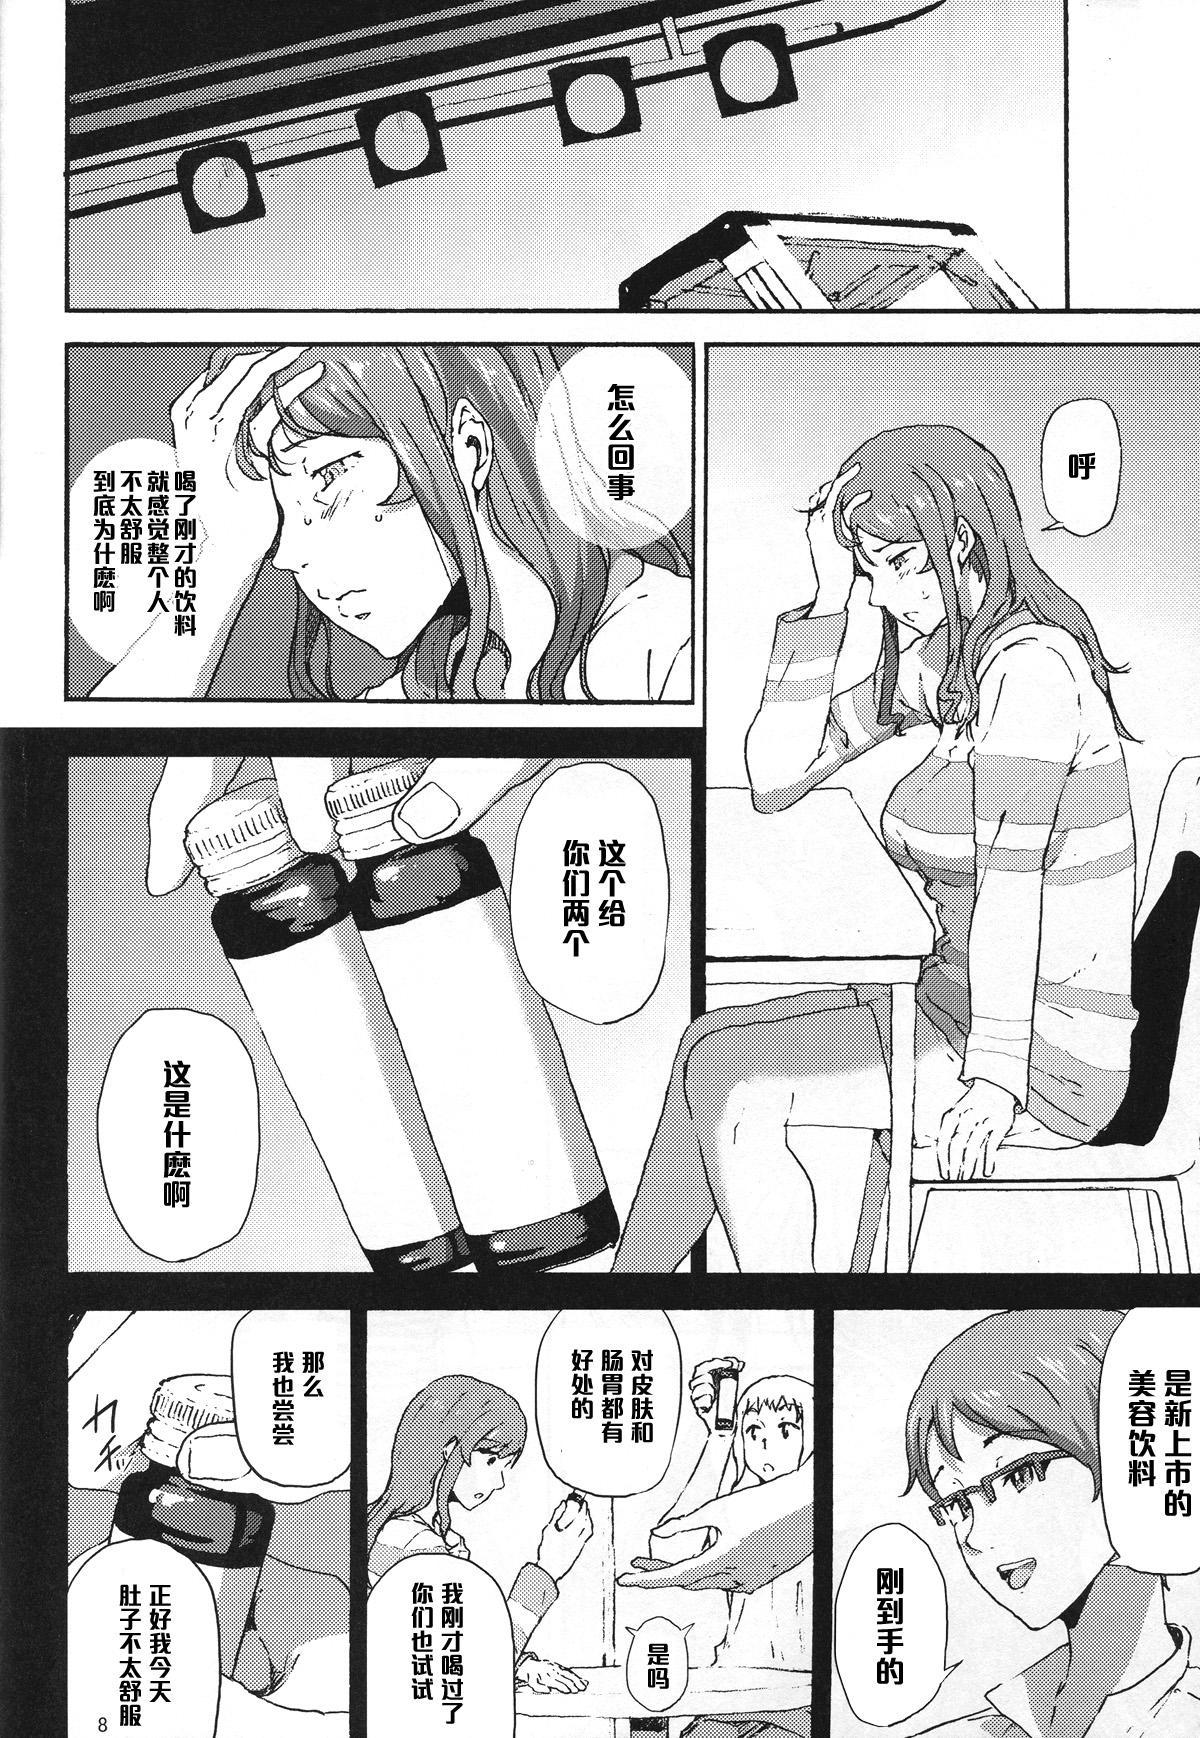 Mirai-chan ga Sandaime SGOCK no Leader ni Damasare Yarechau Hon 7